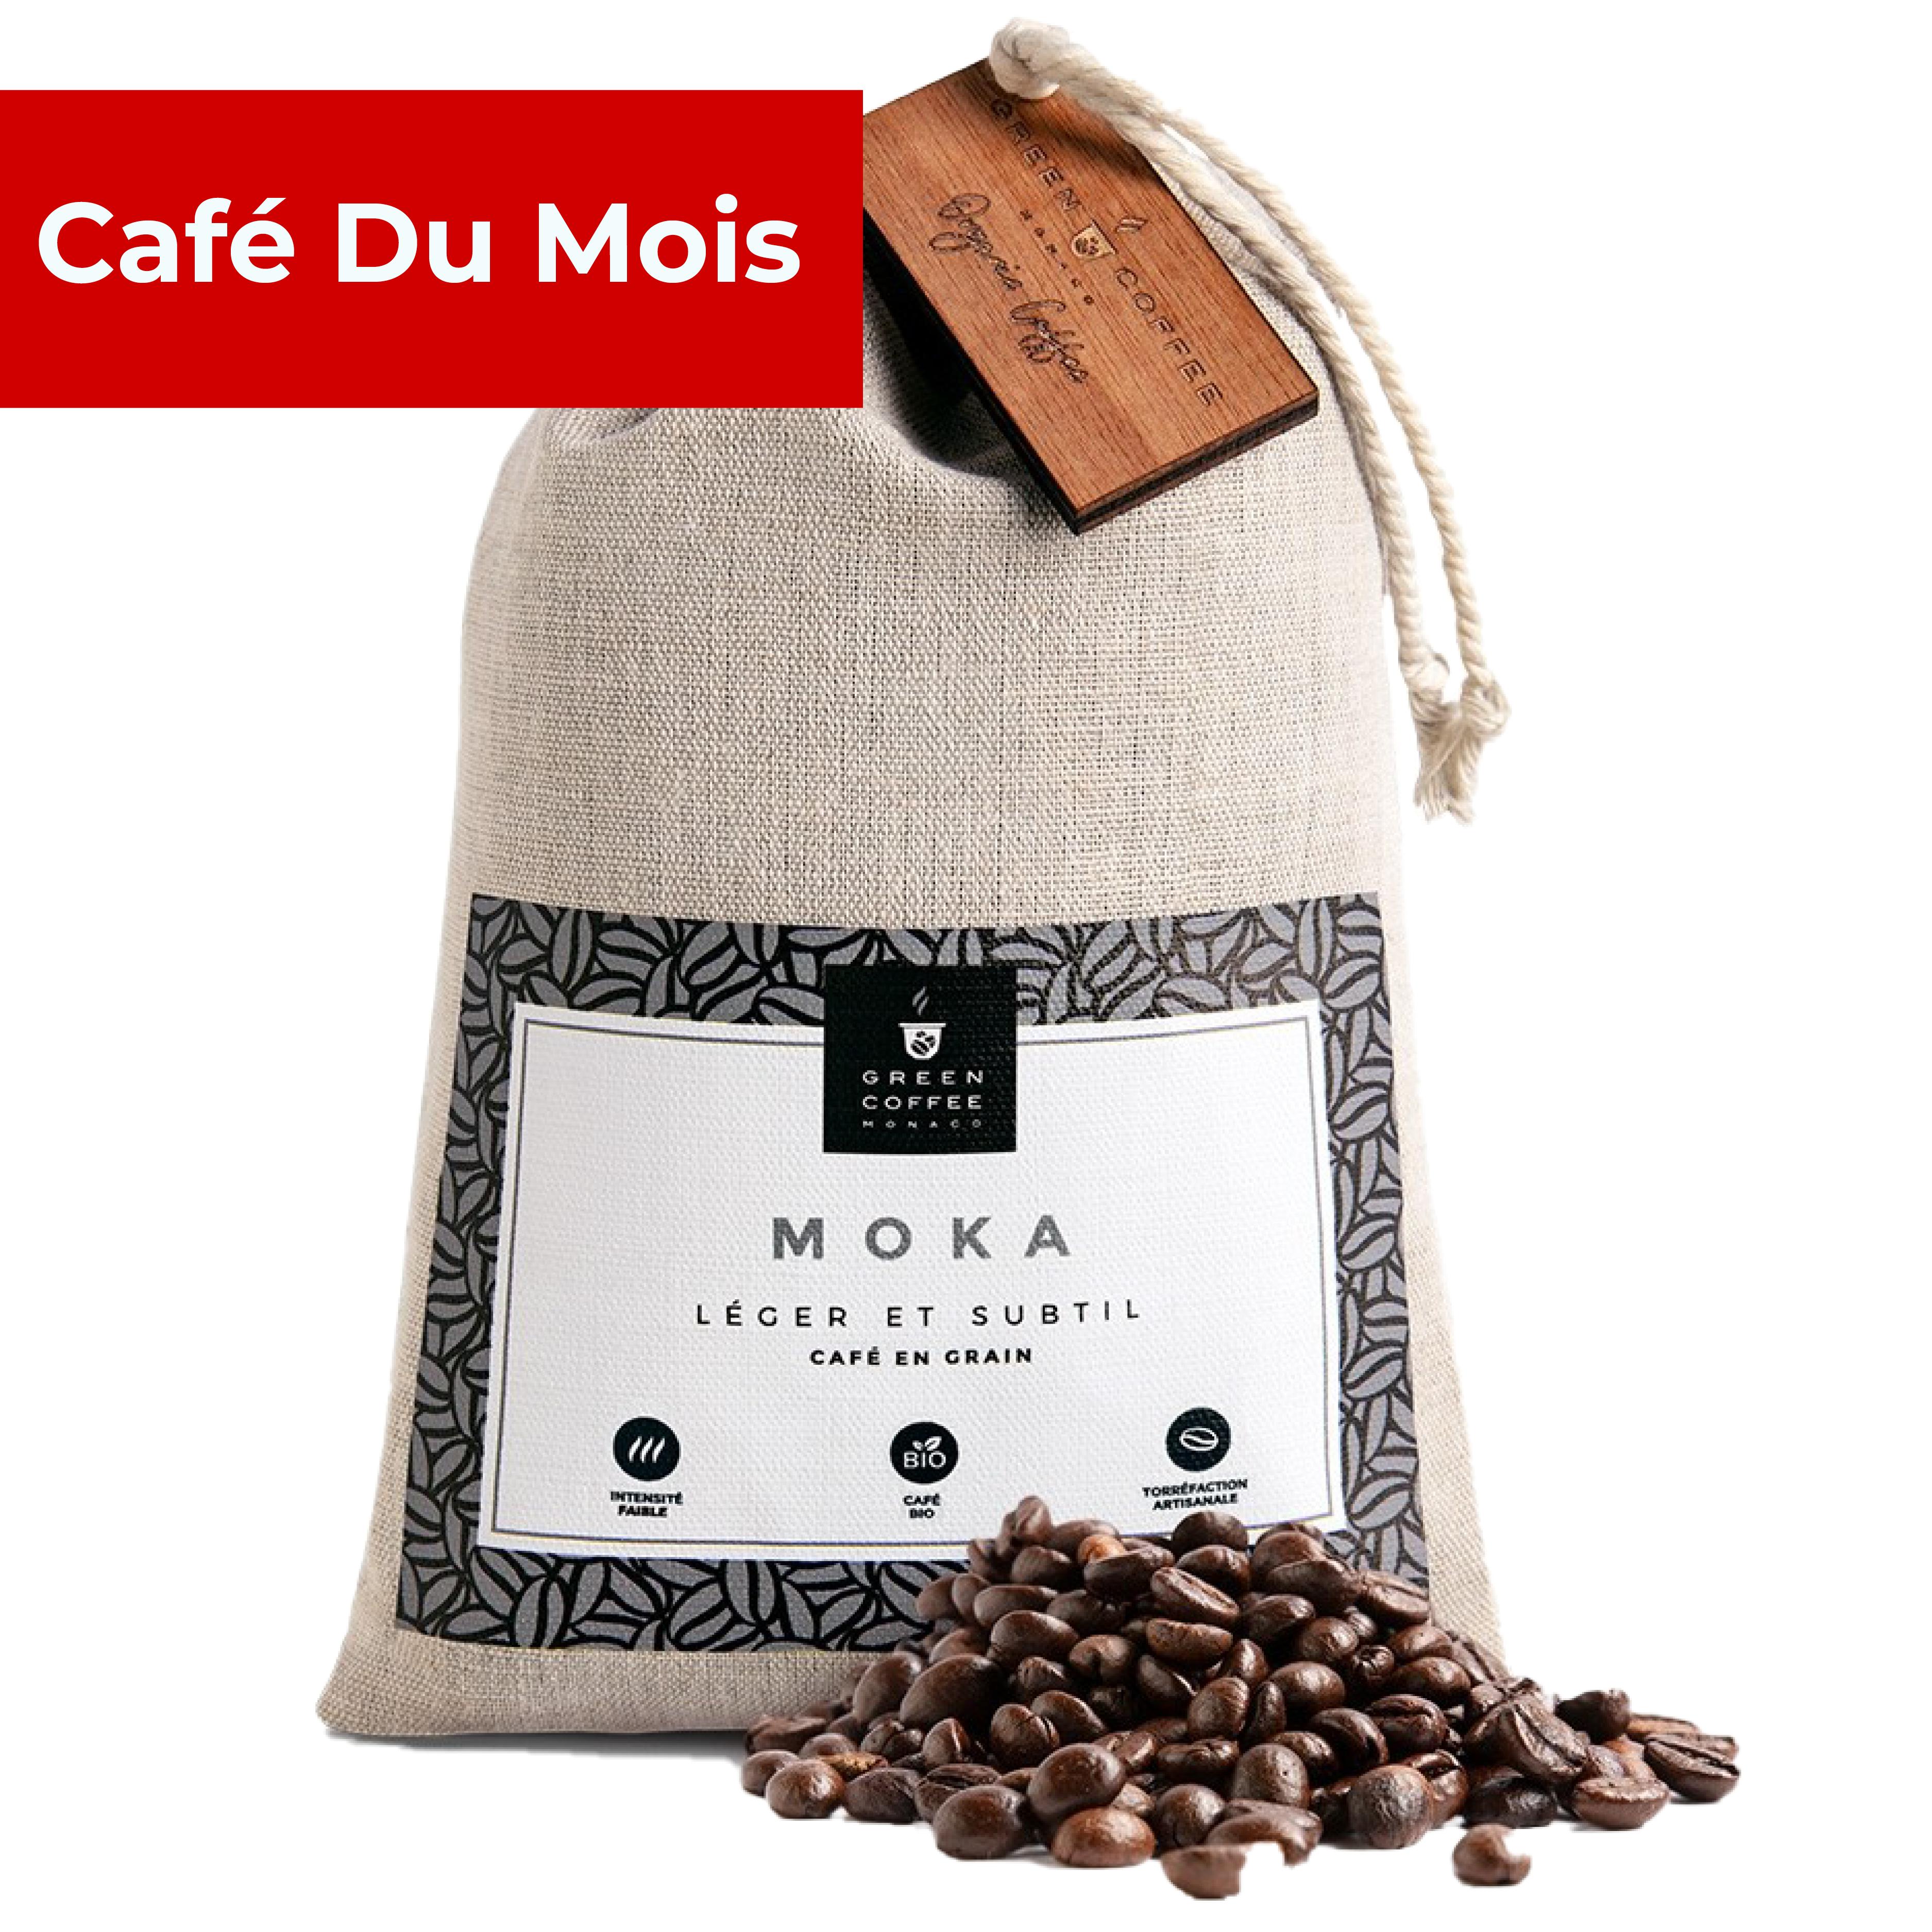 Moka Coffee Beans